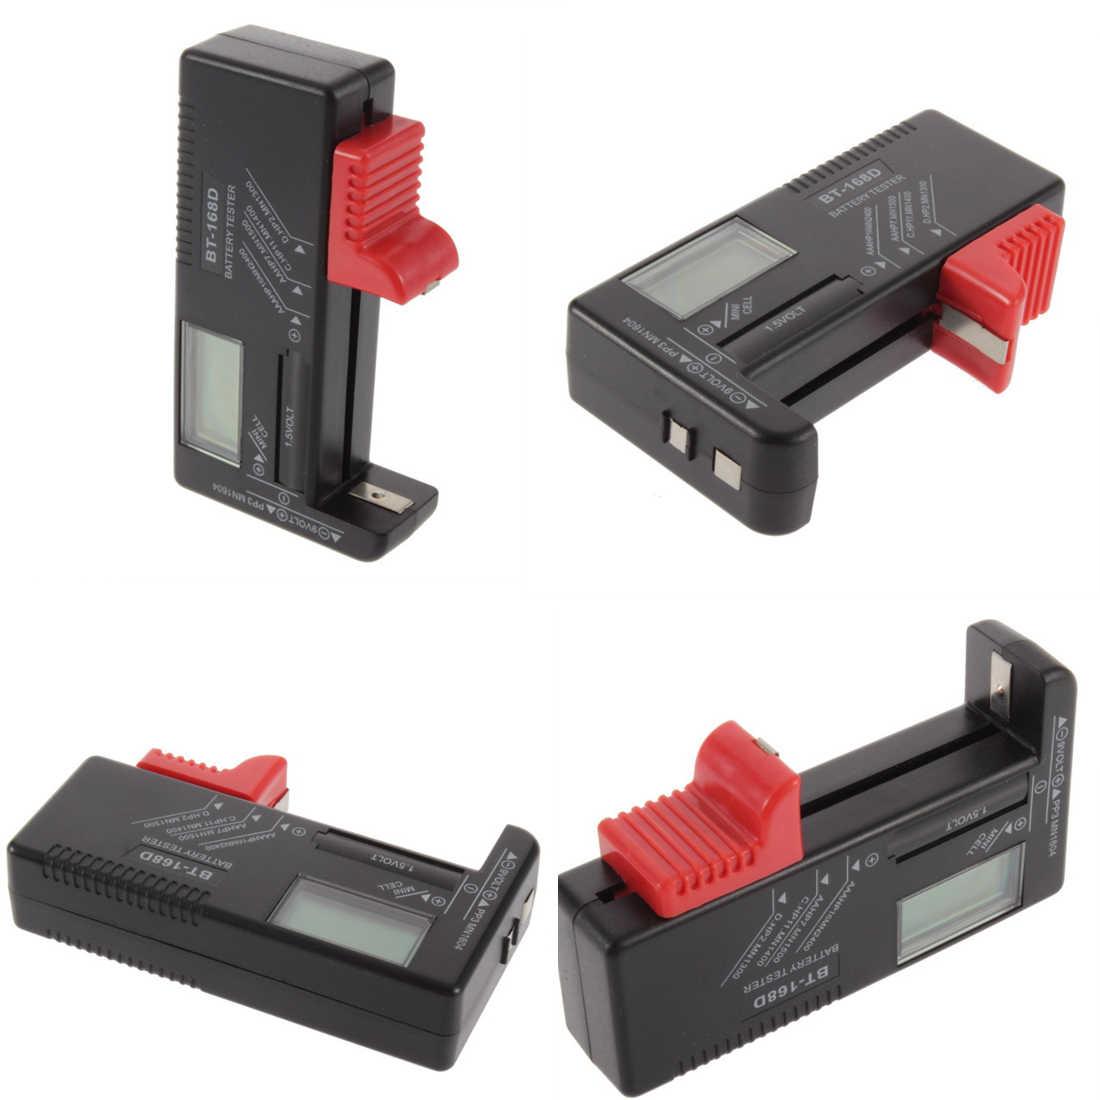 Batterij tester 1pc Universele LCD AA/AAA/C/D/9 V/1.5 V Knop mobiele Batterij Tester BT-168D Digitale display batterij capaciteit tester